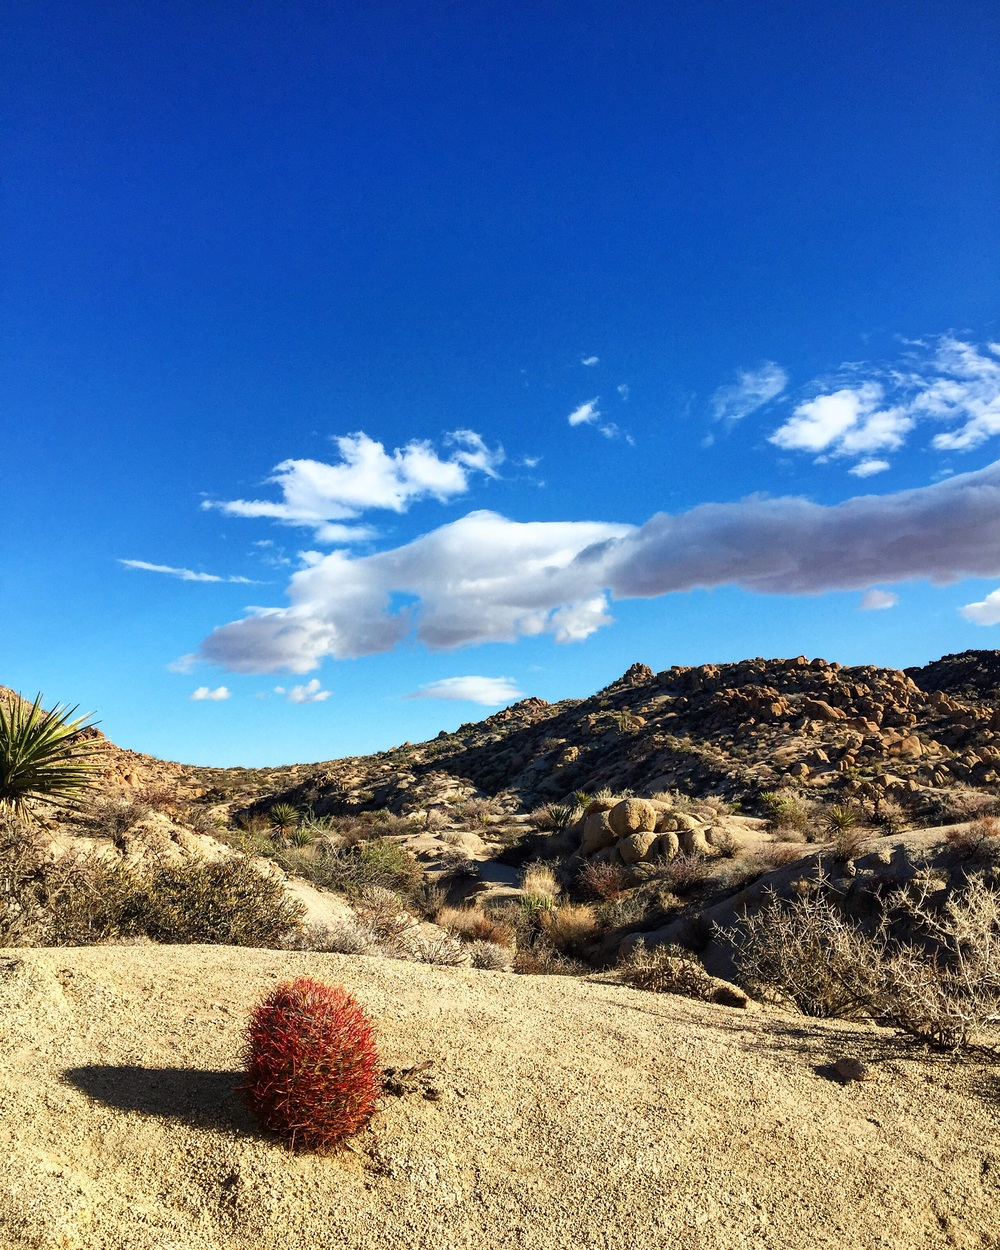 Bartholomew The Barrel Cactus// Joshua Tree, California